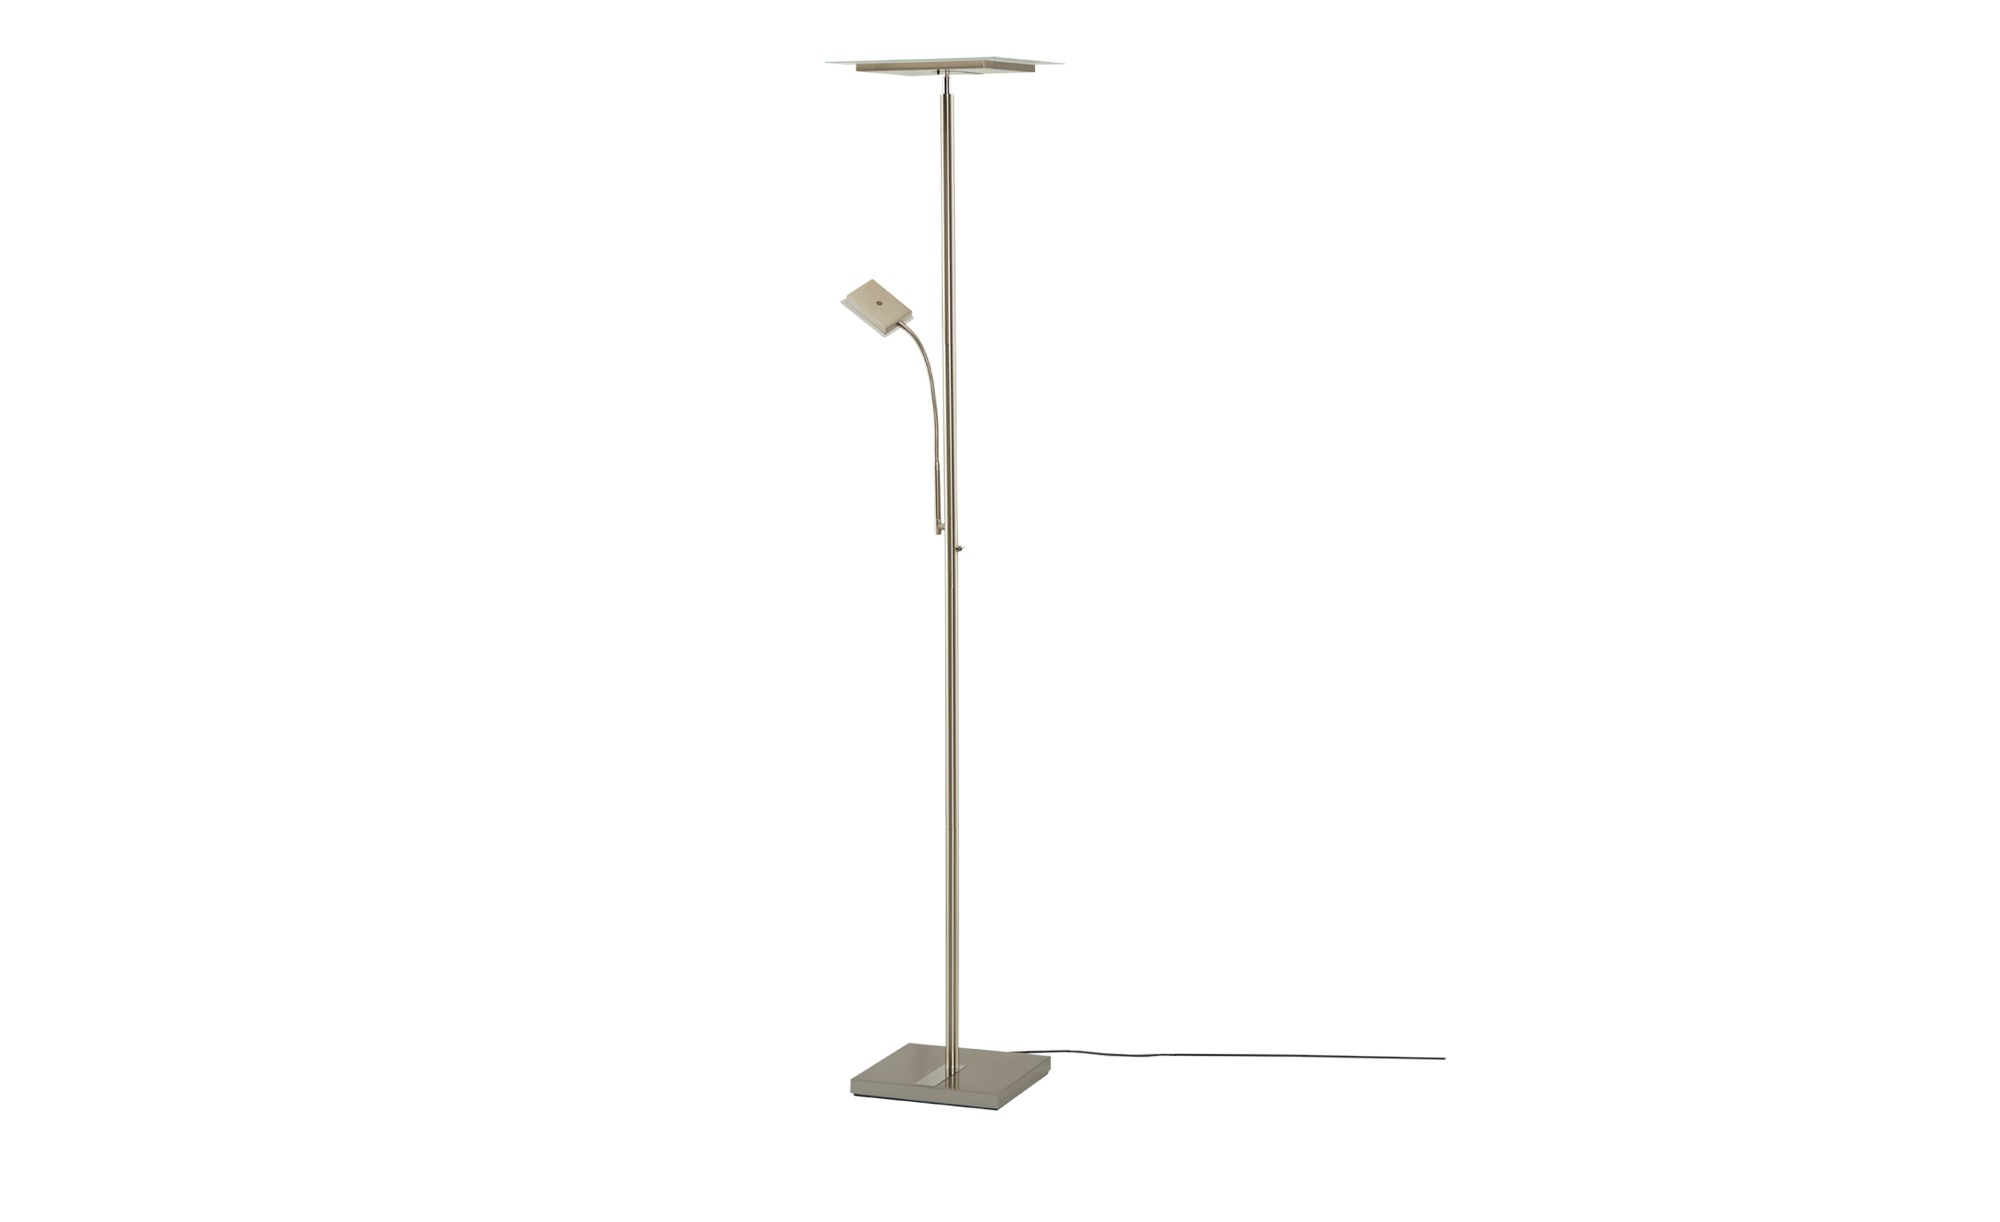 Paul Sommerkamp Leuchten LED-Deckenfluter mit Fernbedienung - silber - 180 cm - Lampen & Leuchten > Innenleuchten > Deckenfluter - Möbel Kraft | Lampen > Stehlampen > Deckenfluter | Paul Sommerkamp Leuchten